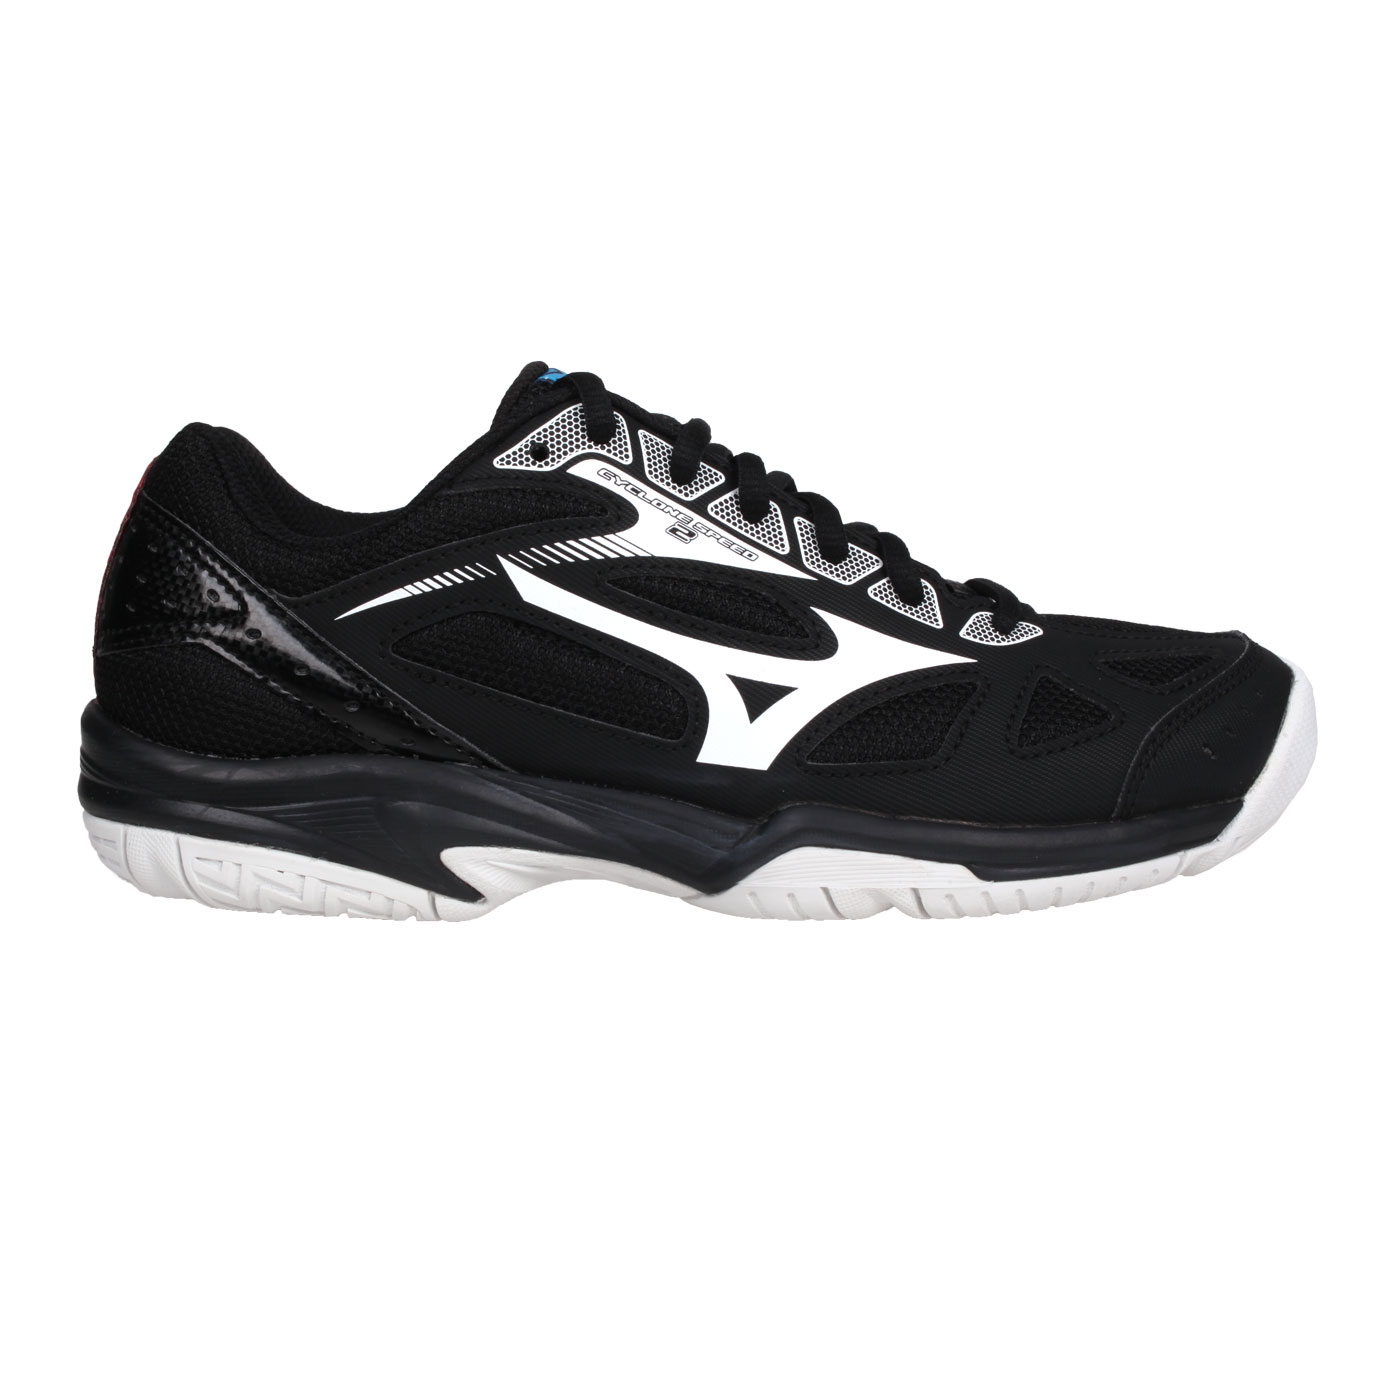 MIZUNO 排球鞋  @CYCLONE SPEED 2@V1GA198002 - 黑紅白藍